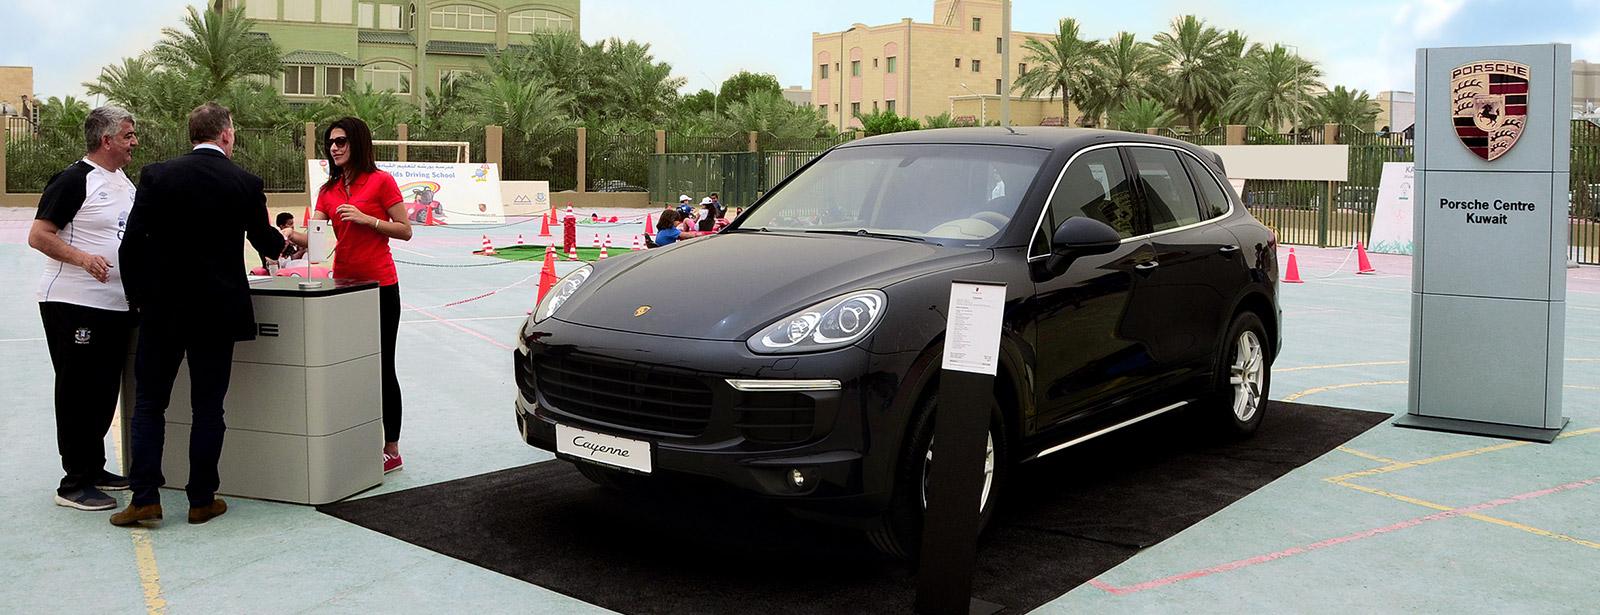 Embassy Driver Jobs In Abu Dhabi